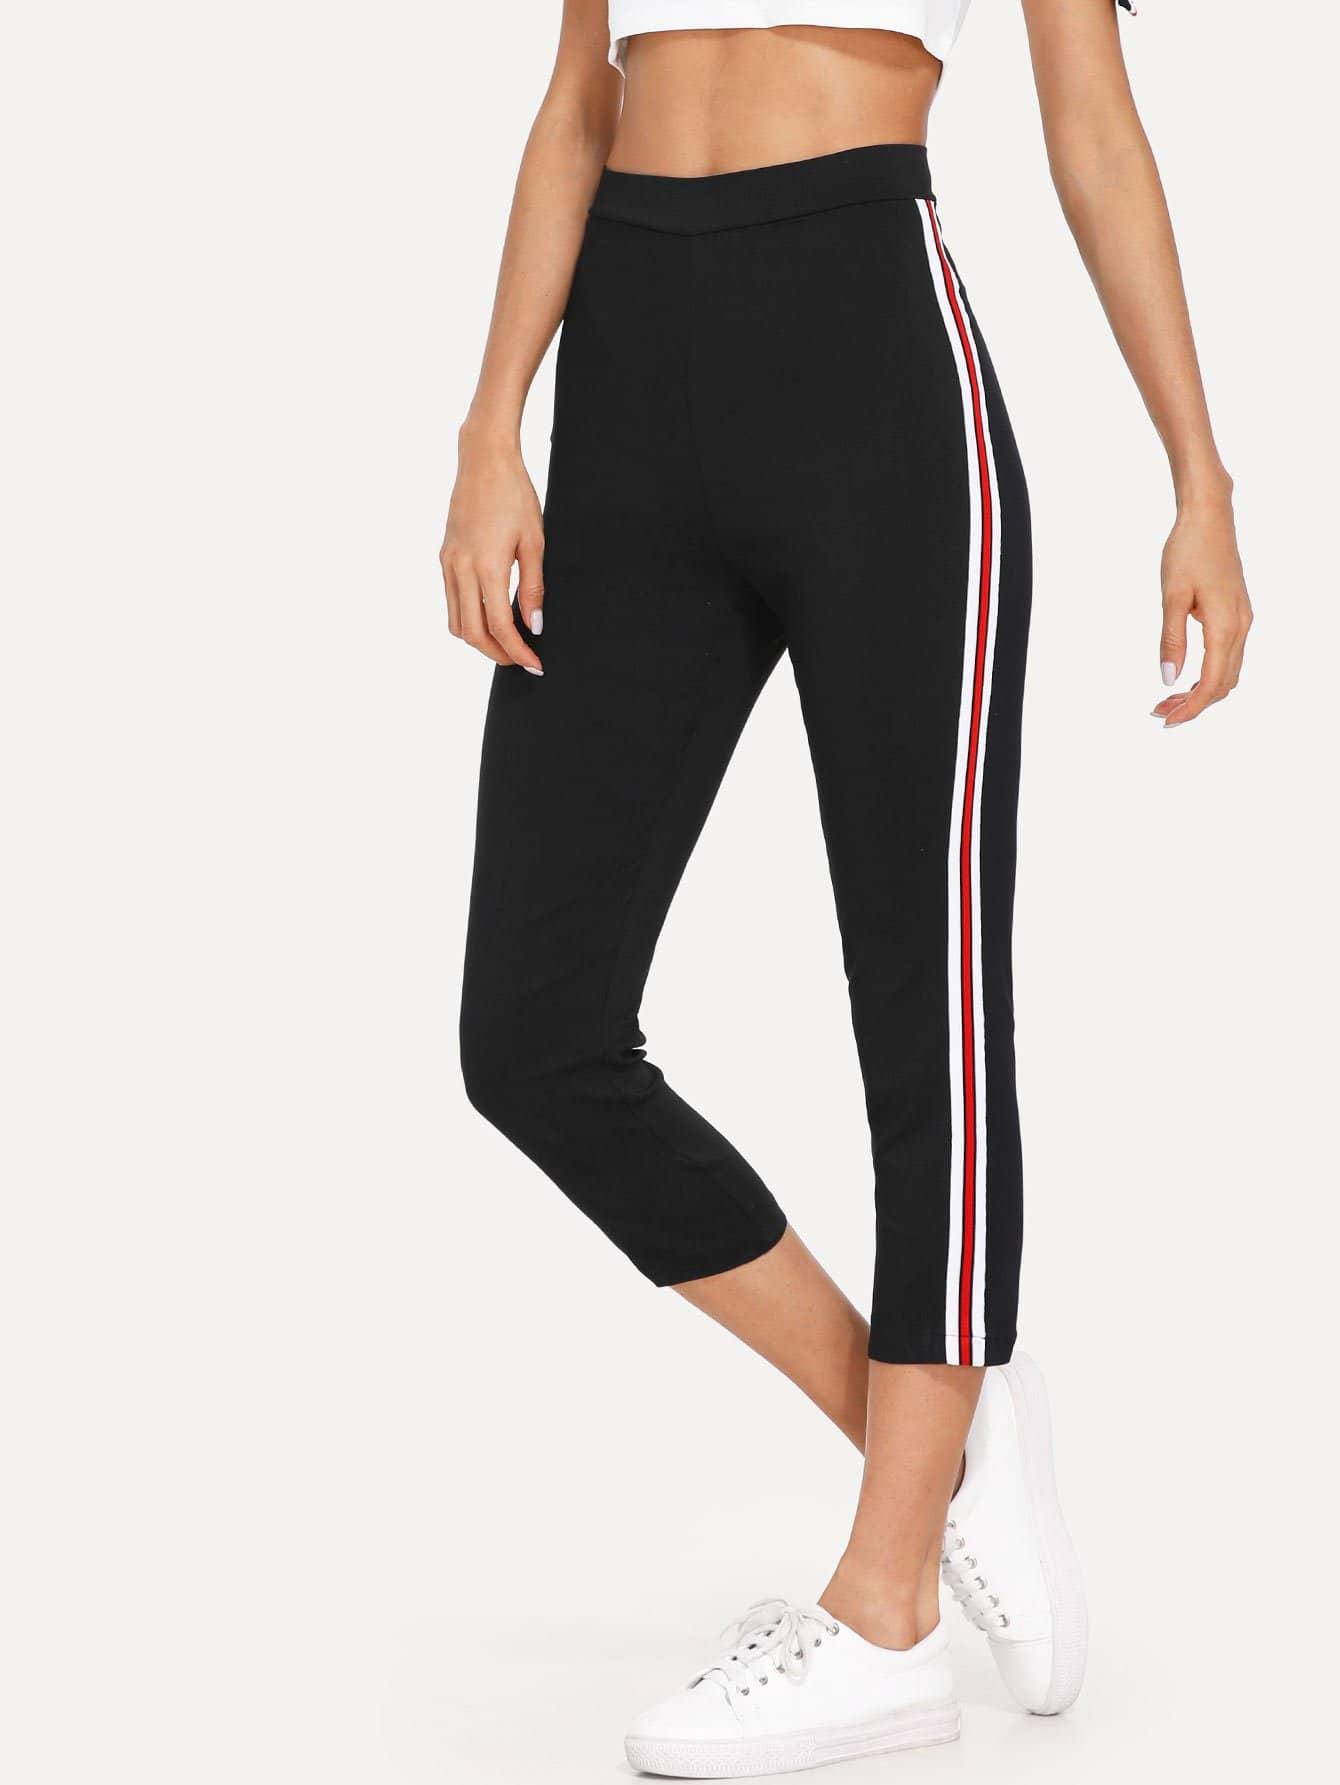 Striped Tape Side Skinny Sweatpants striped tape side cuffed pants